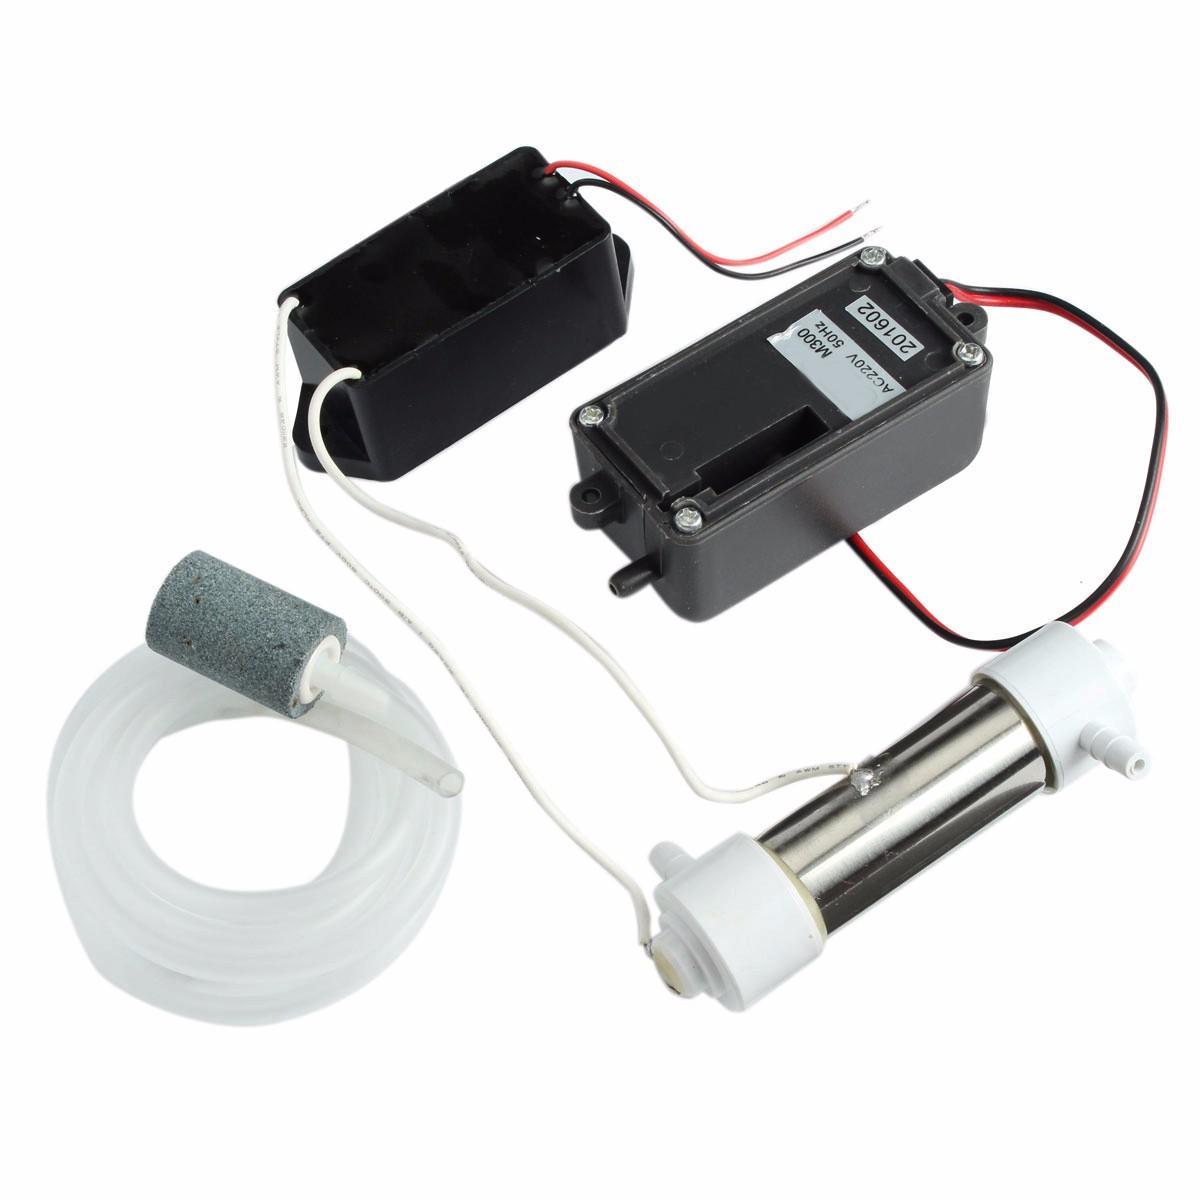 AC220V 500mg Ozon Generator Ozon Vand Air Clean Sterilisator Ozonizer Purifier DIY